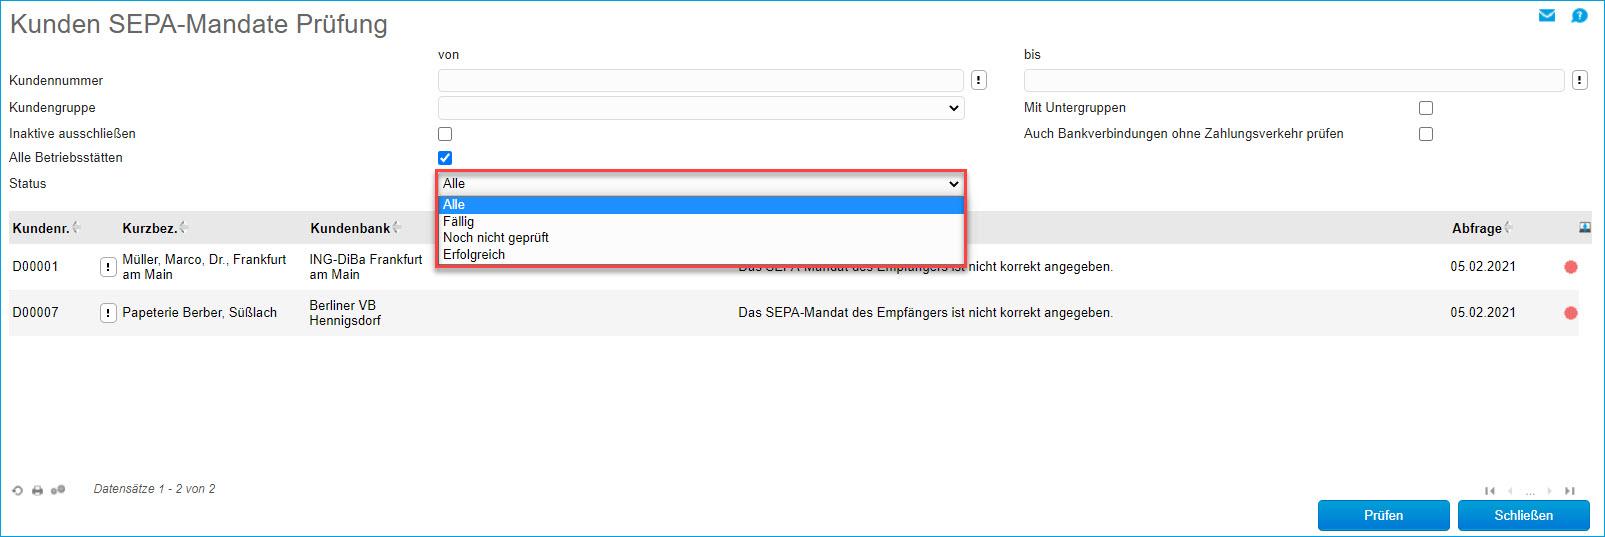 Kunden SEPA-Mandate Prüfung 1